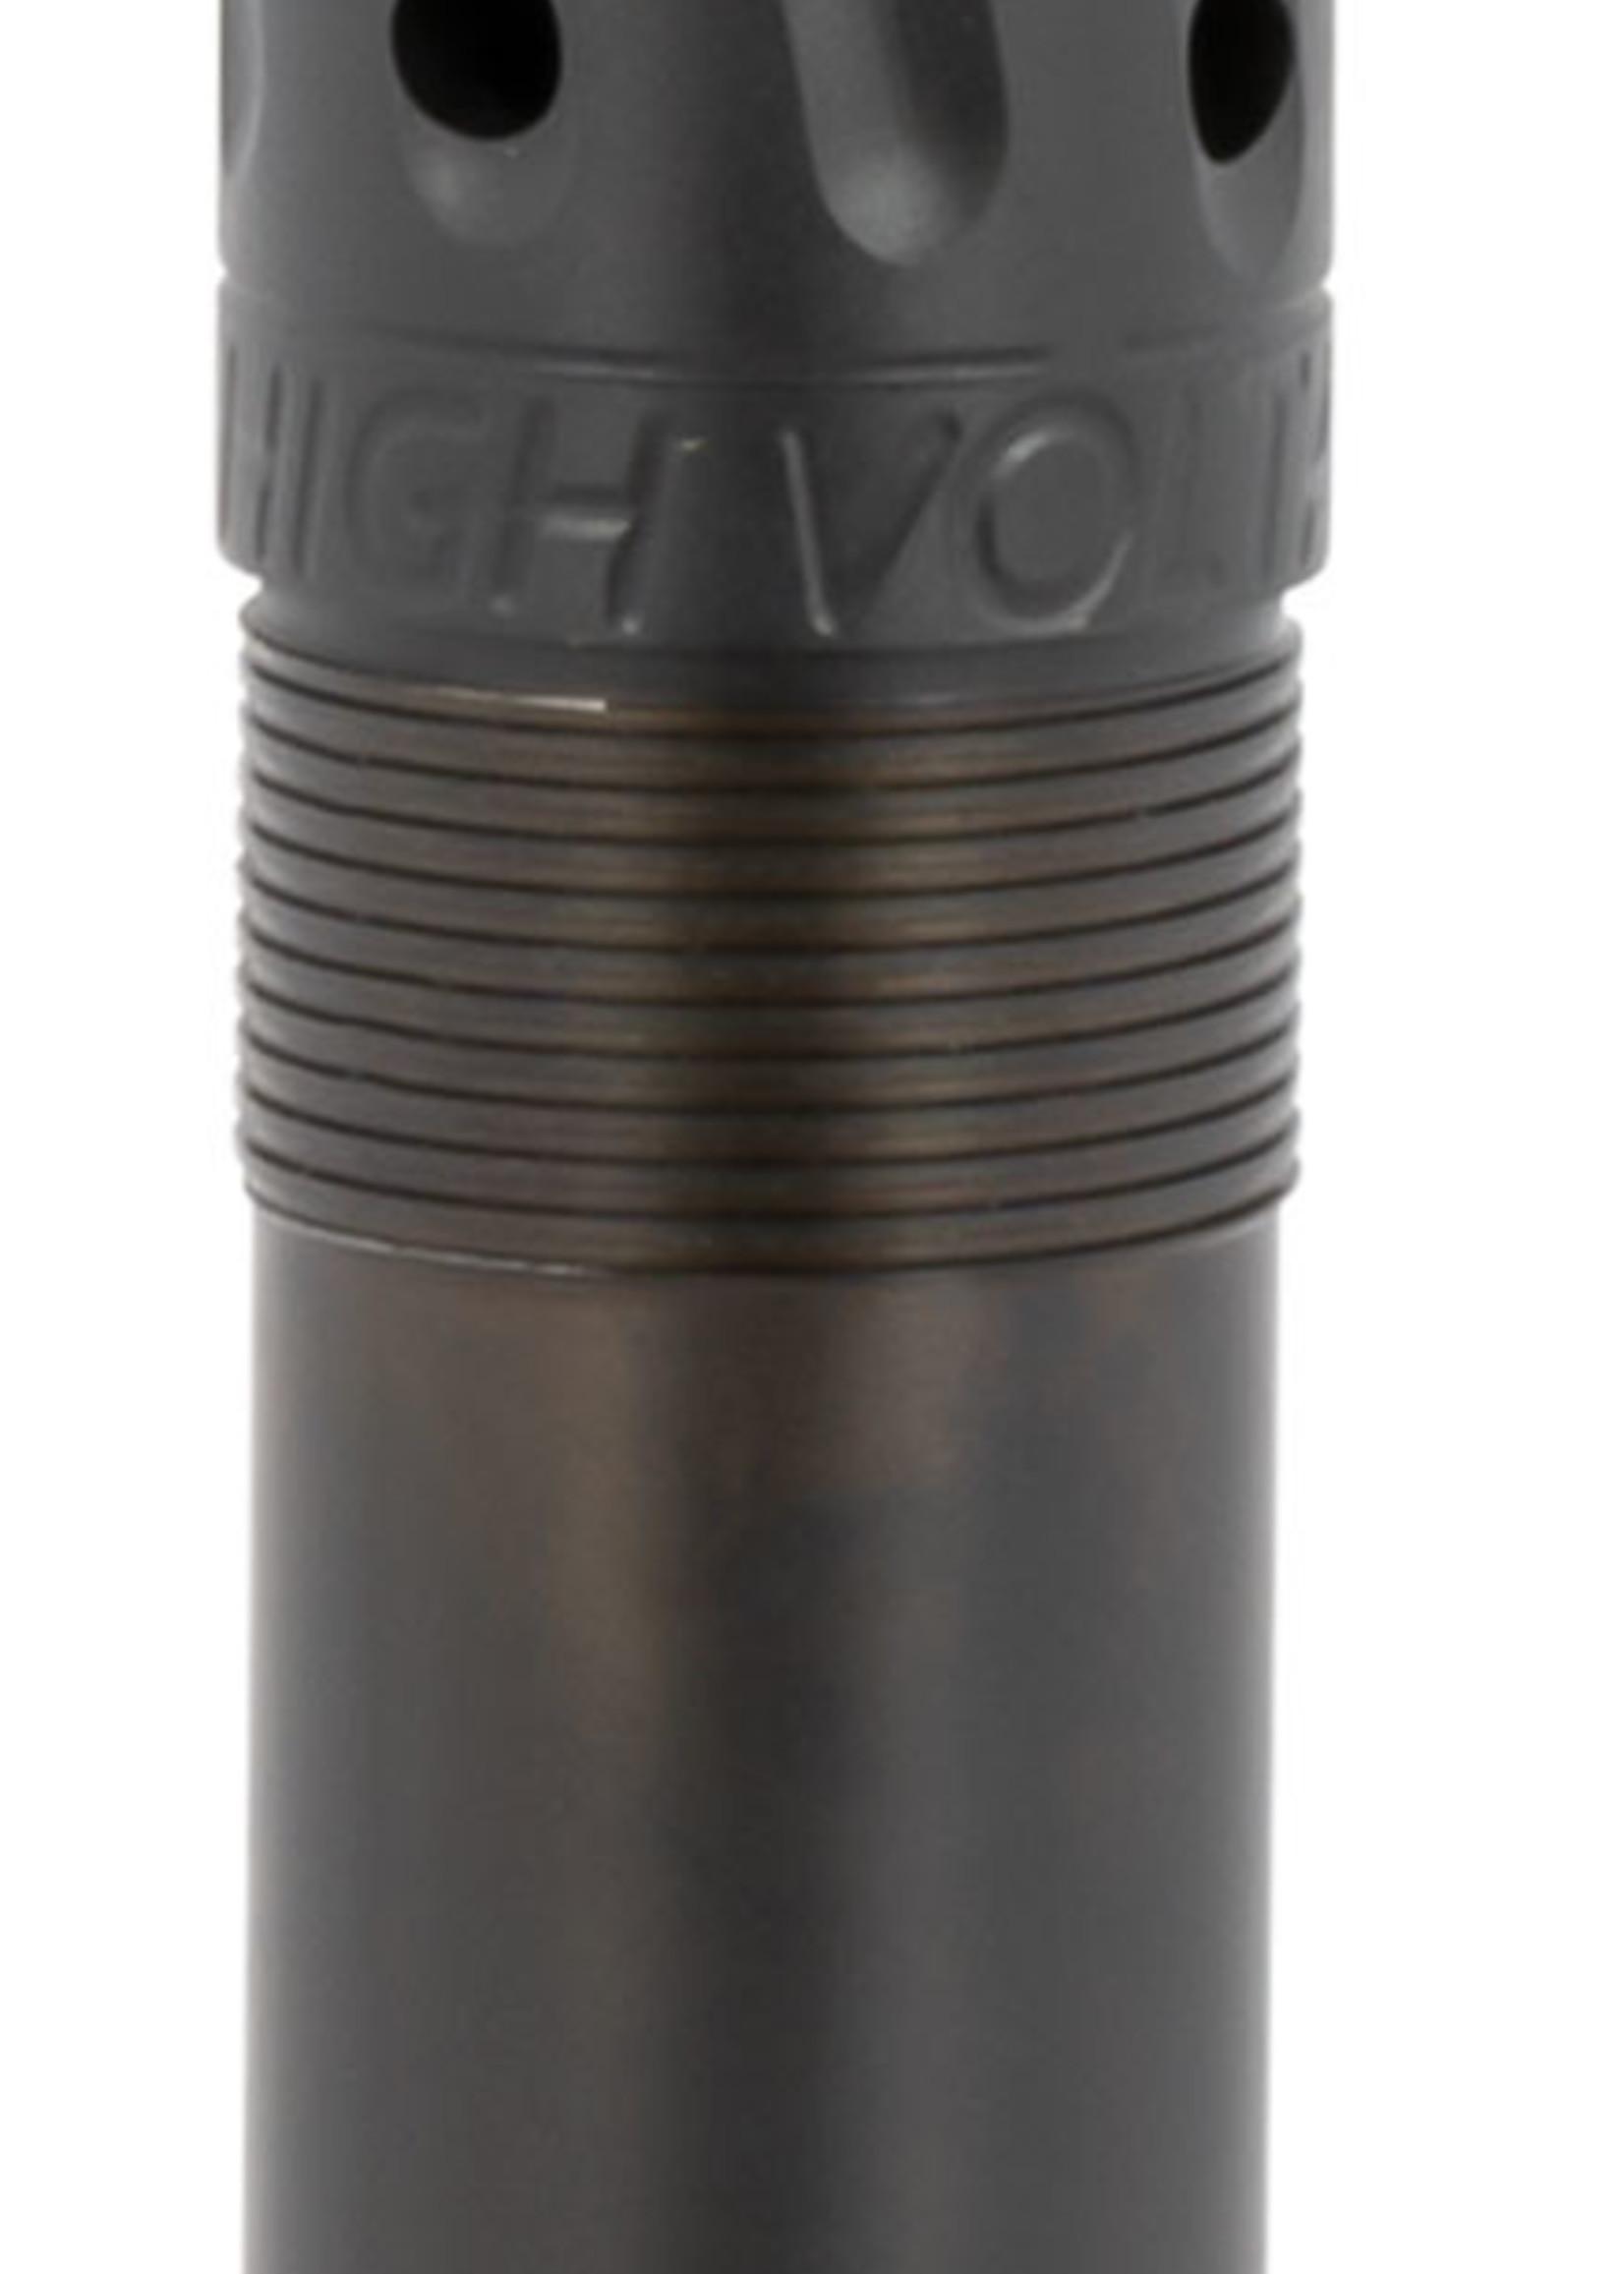 Jebs Choke Tubes Jebs High Voltage 20ga Mobl .580